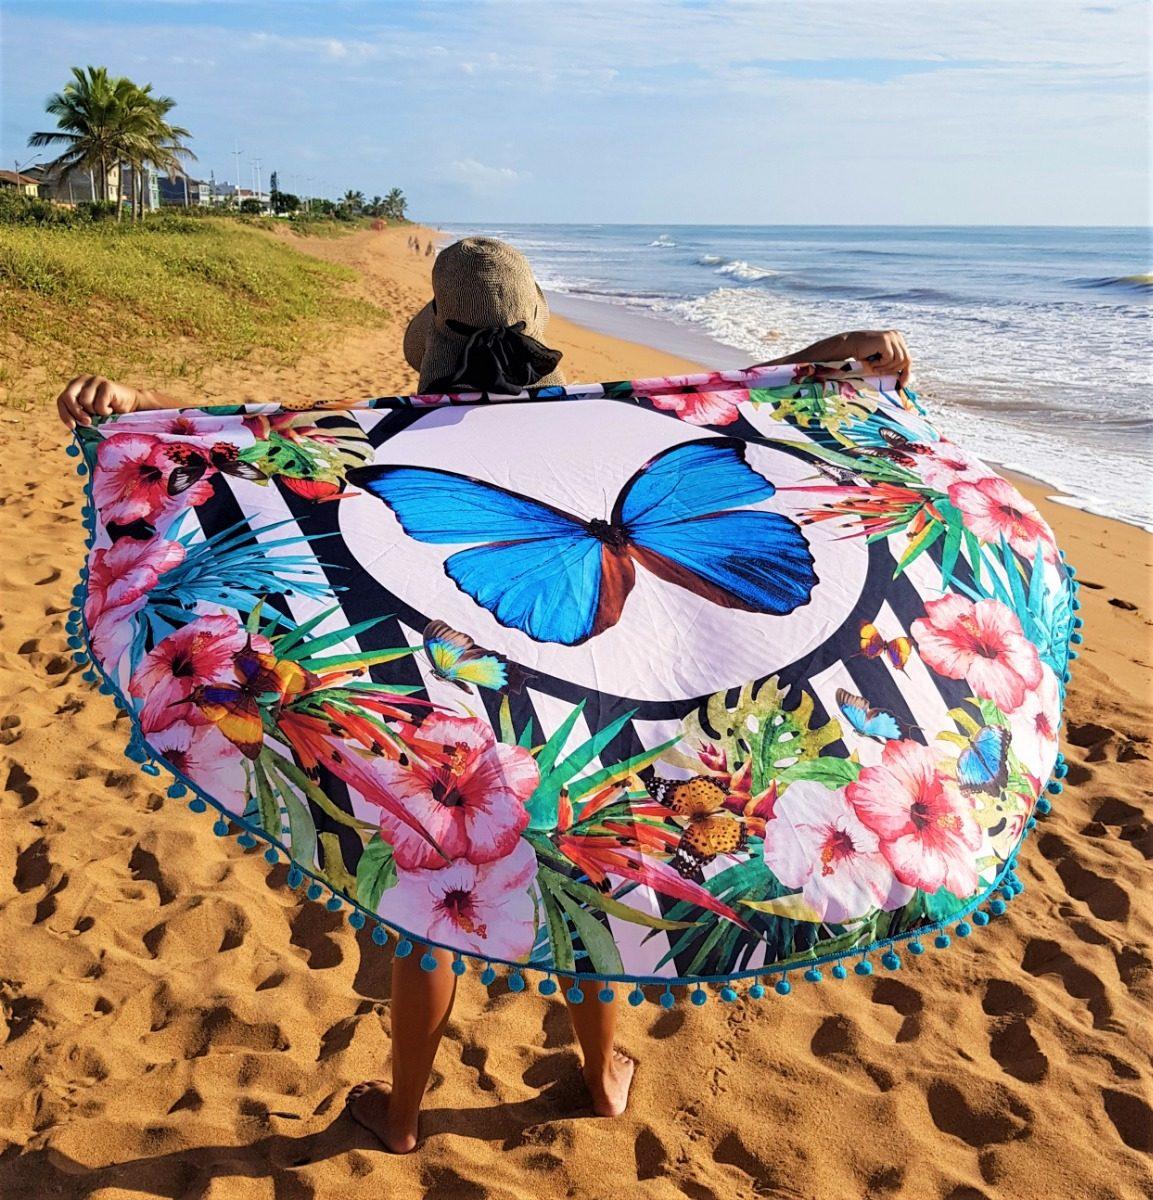 ae2b27c82 Canga Redona, Saída De Praia, Luxo, Moda Praia, Borboleta - R$ 139 ...